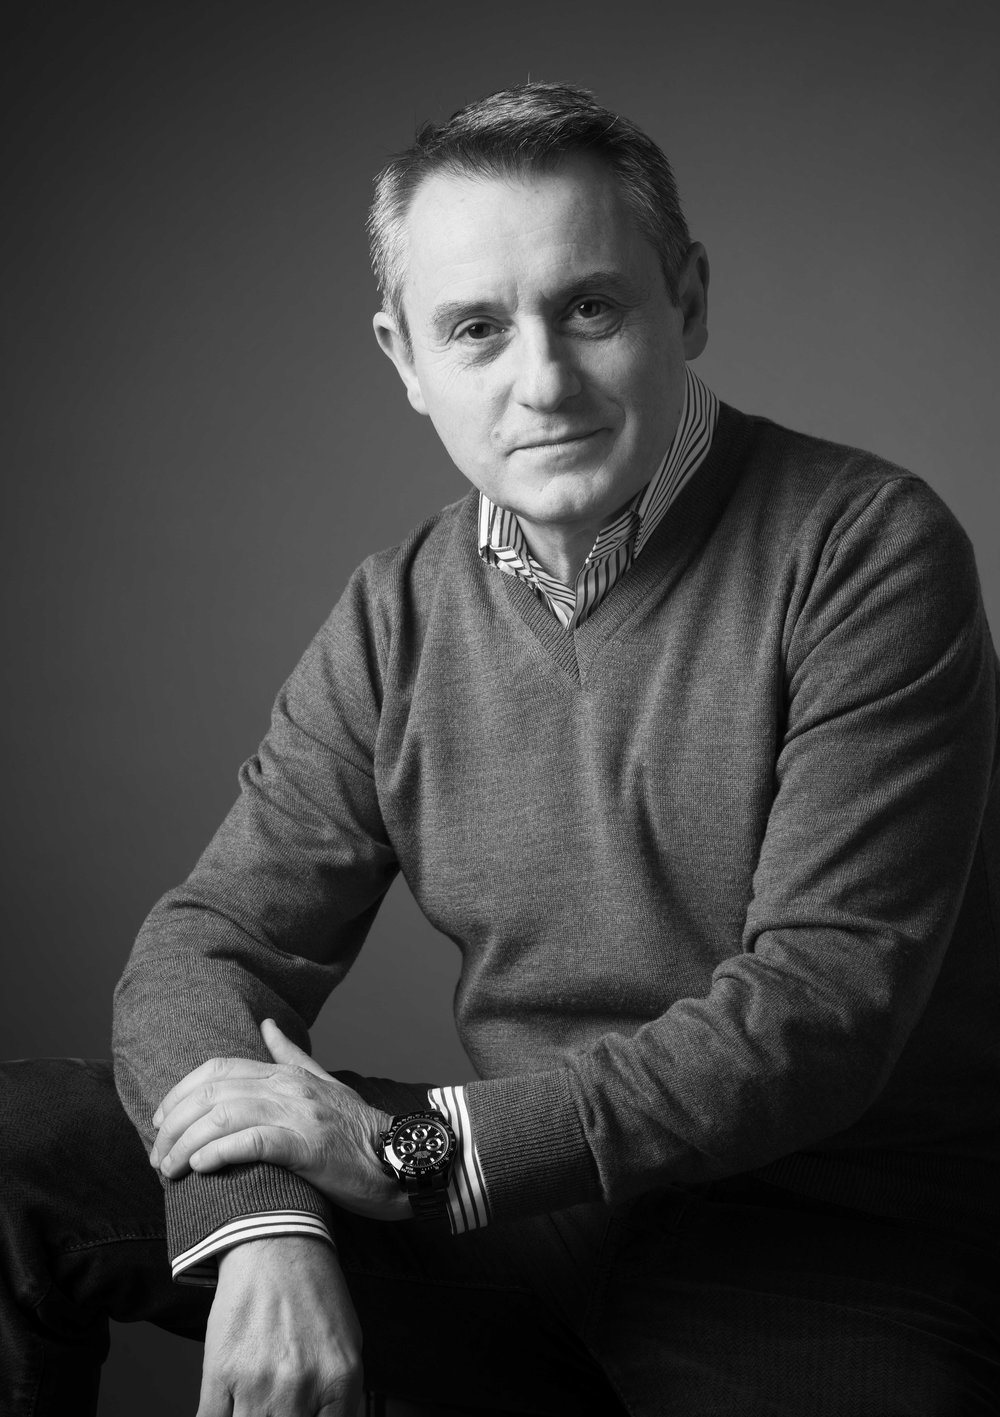 GIACOMO CATTANI - STUDIO SAGITAIR